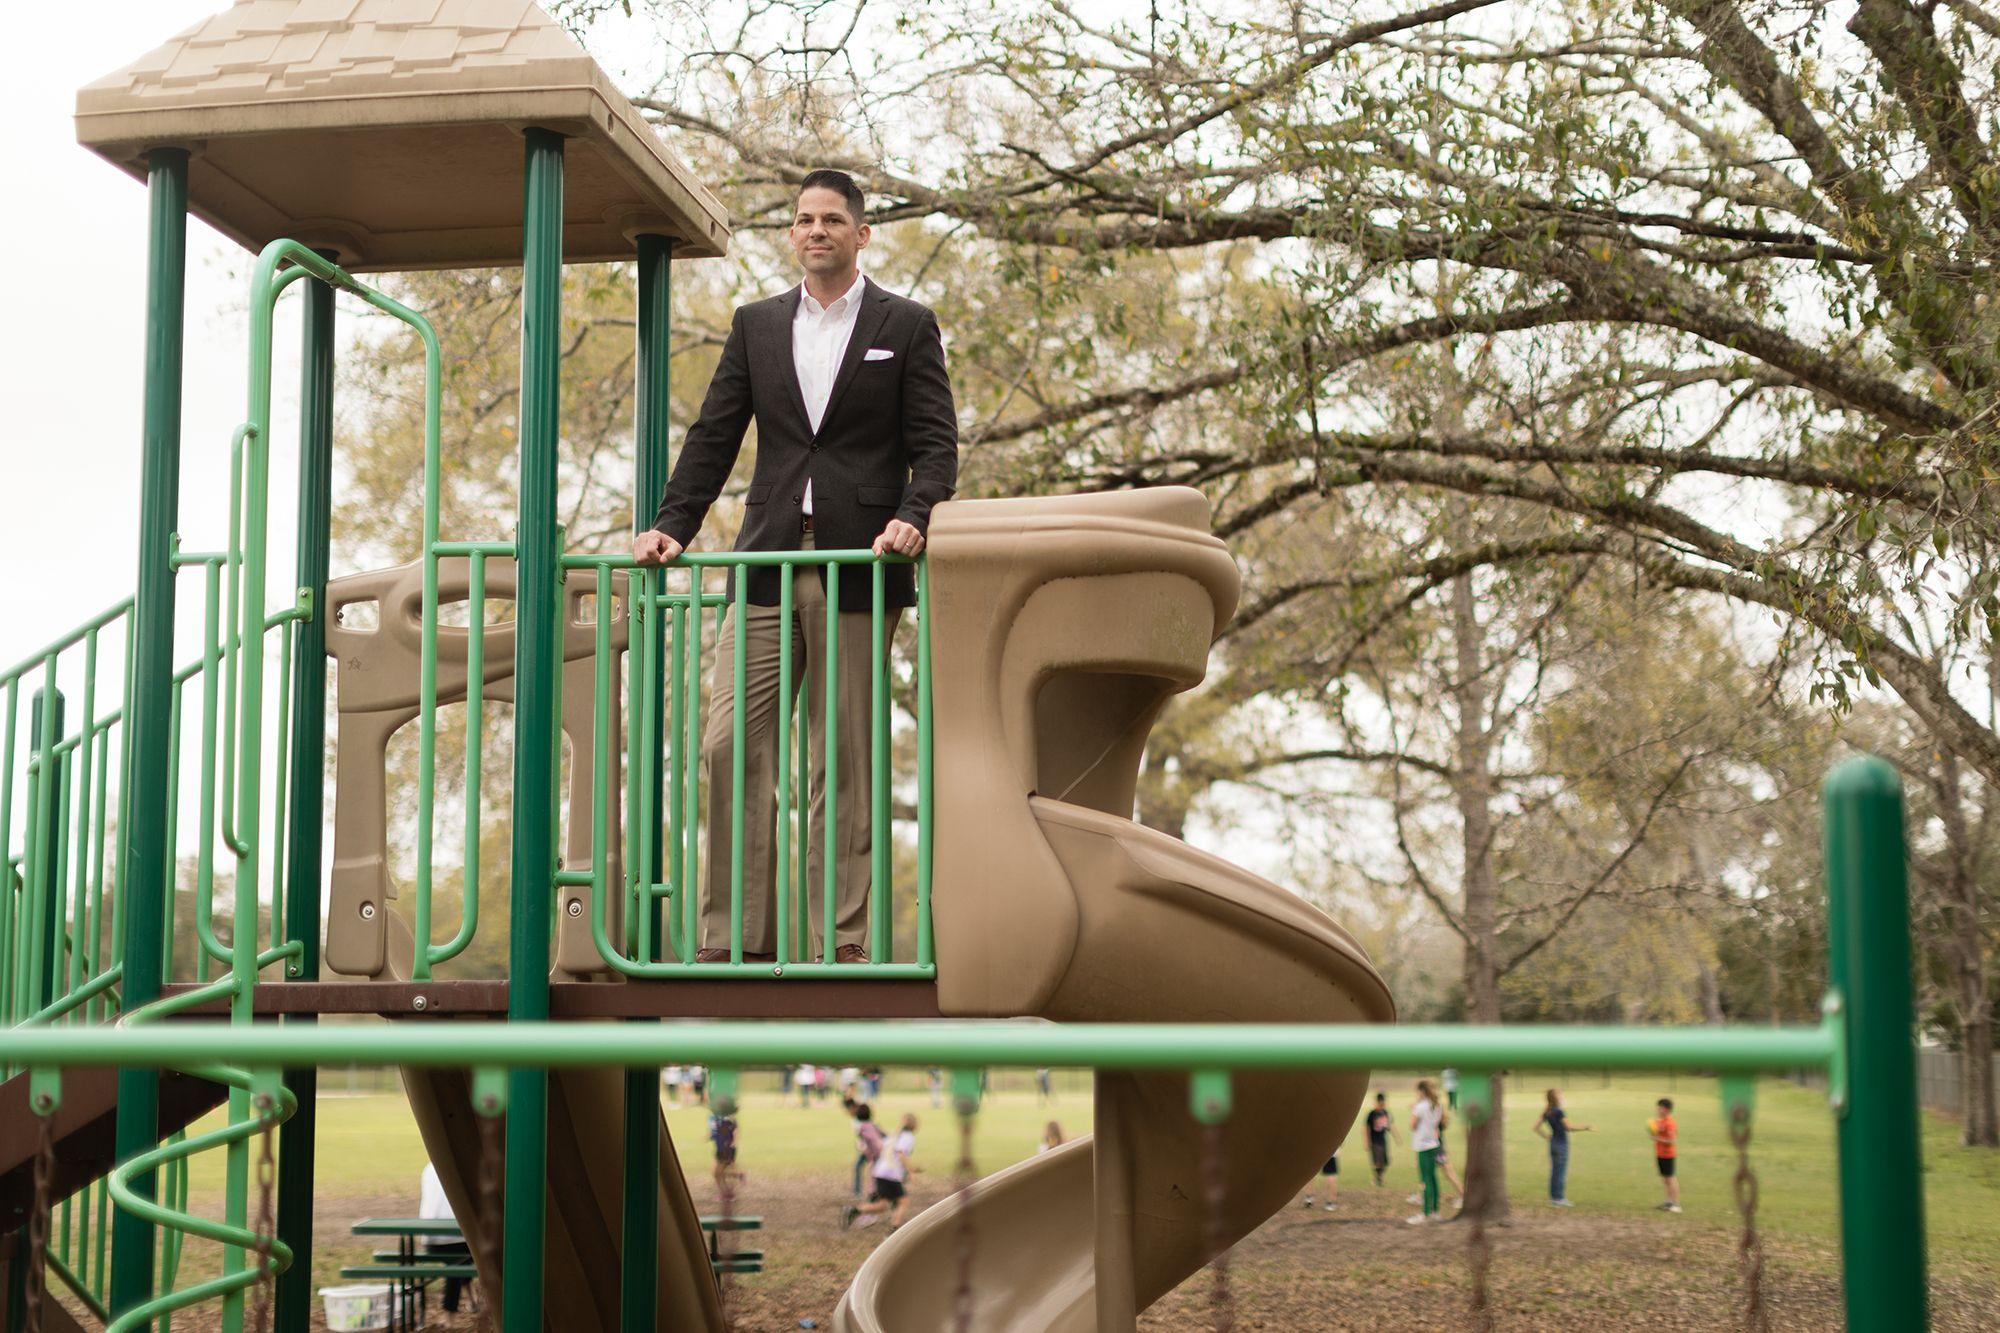 Neil Otto '05 pictured on playground near campus.